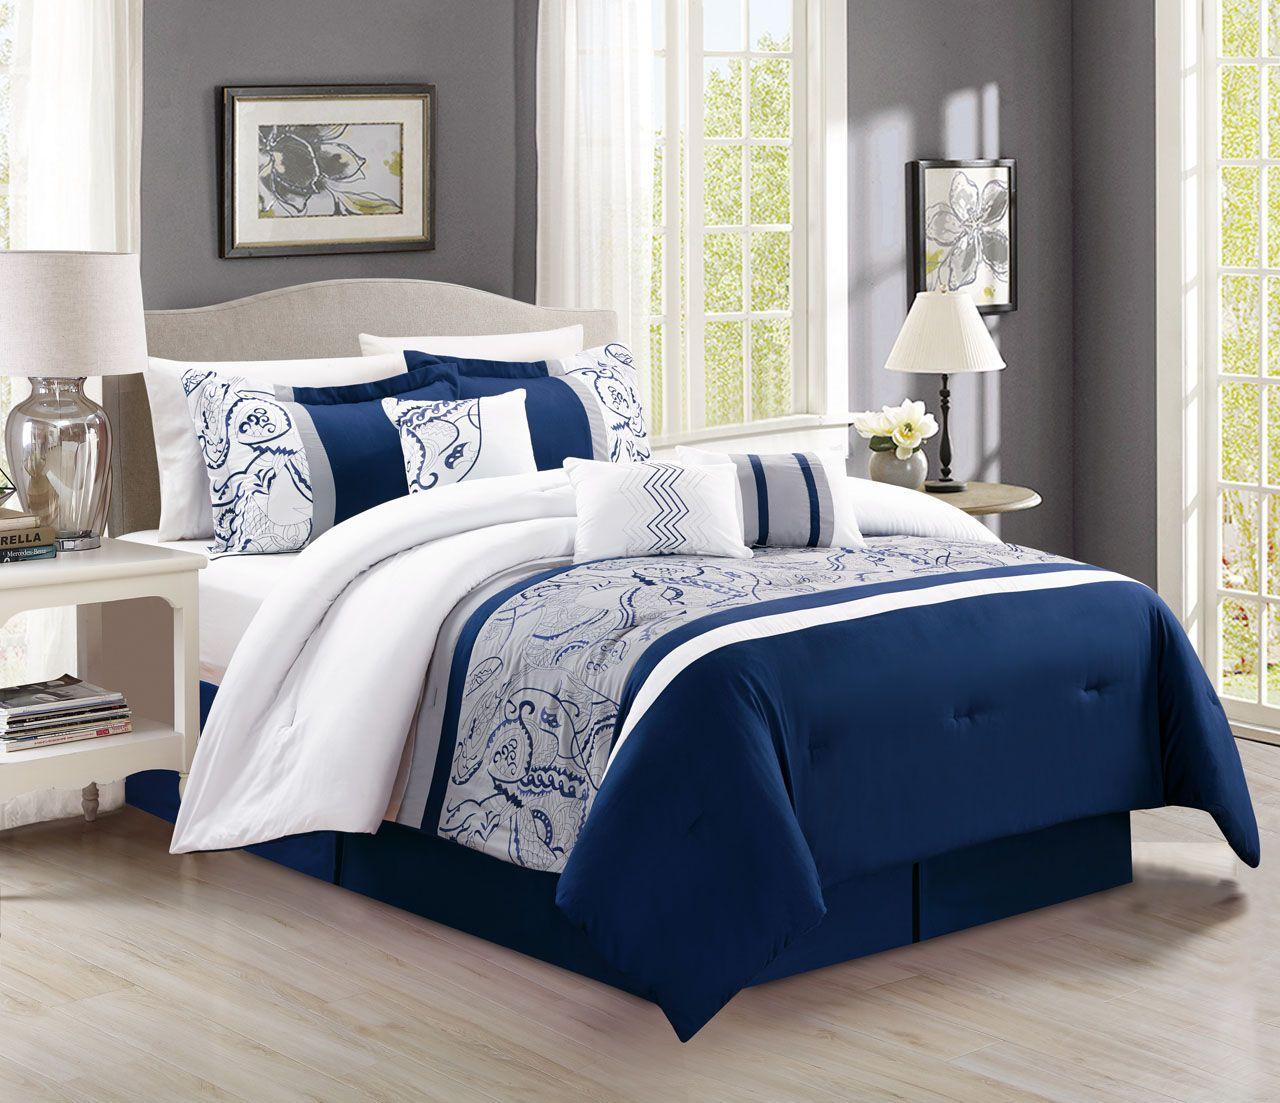 7 Piece Navy White Paisley Comforter Set Navy Bed Set Comforter Sets Bed Comforter Sets